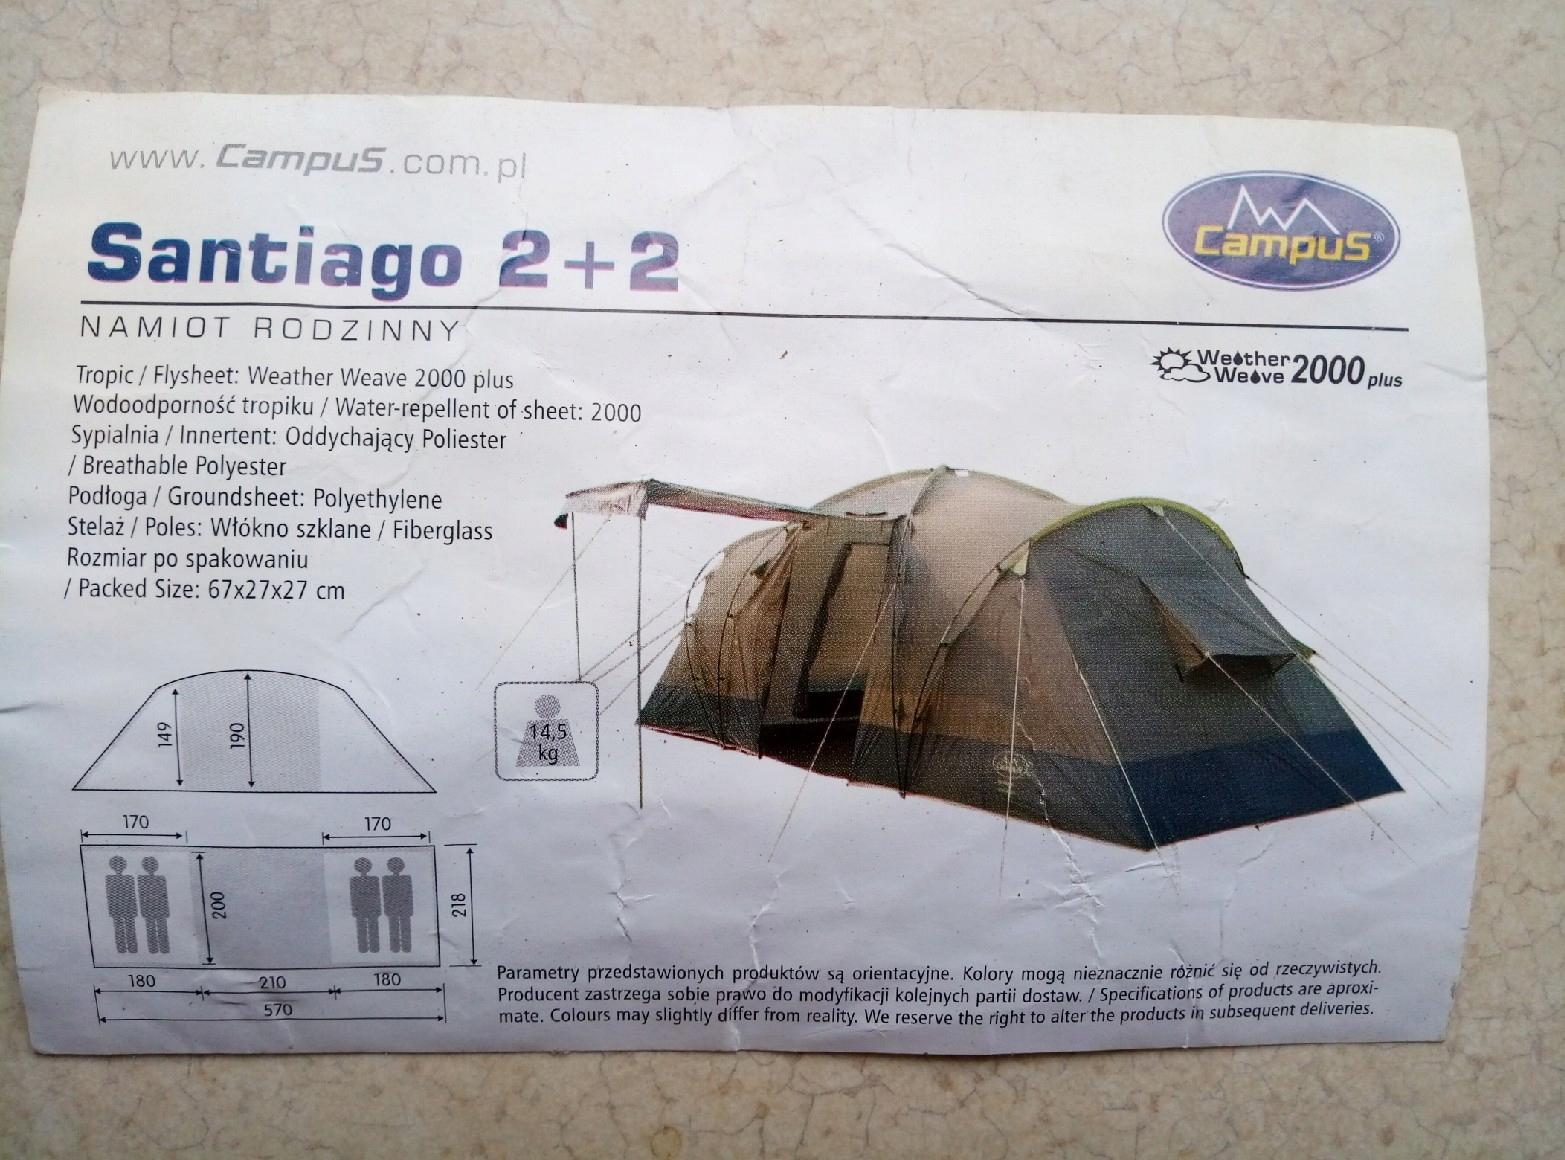 Namiot turystyczny 2+2 marki Campus